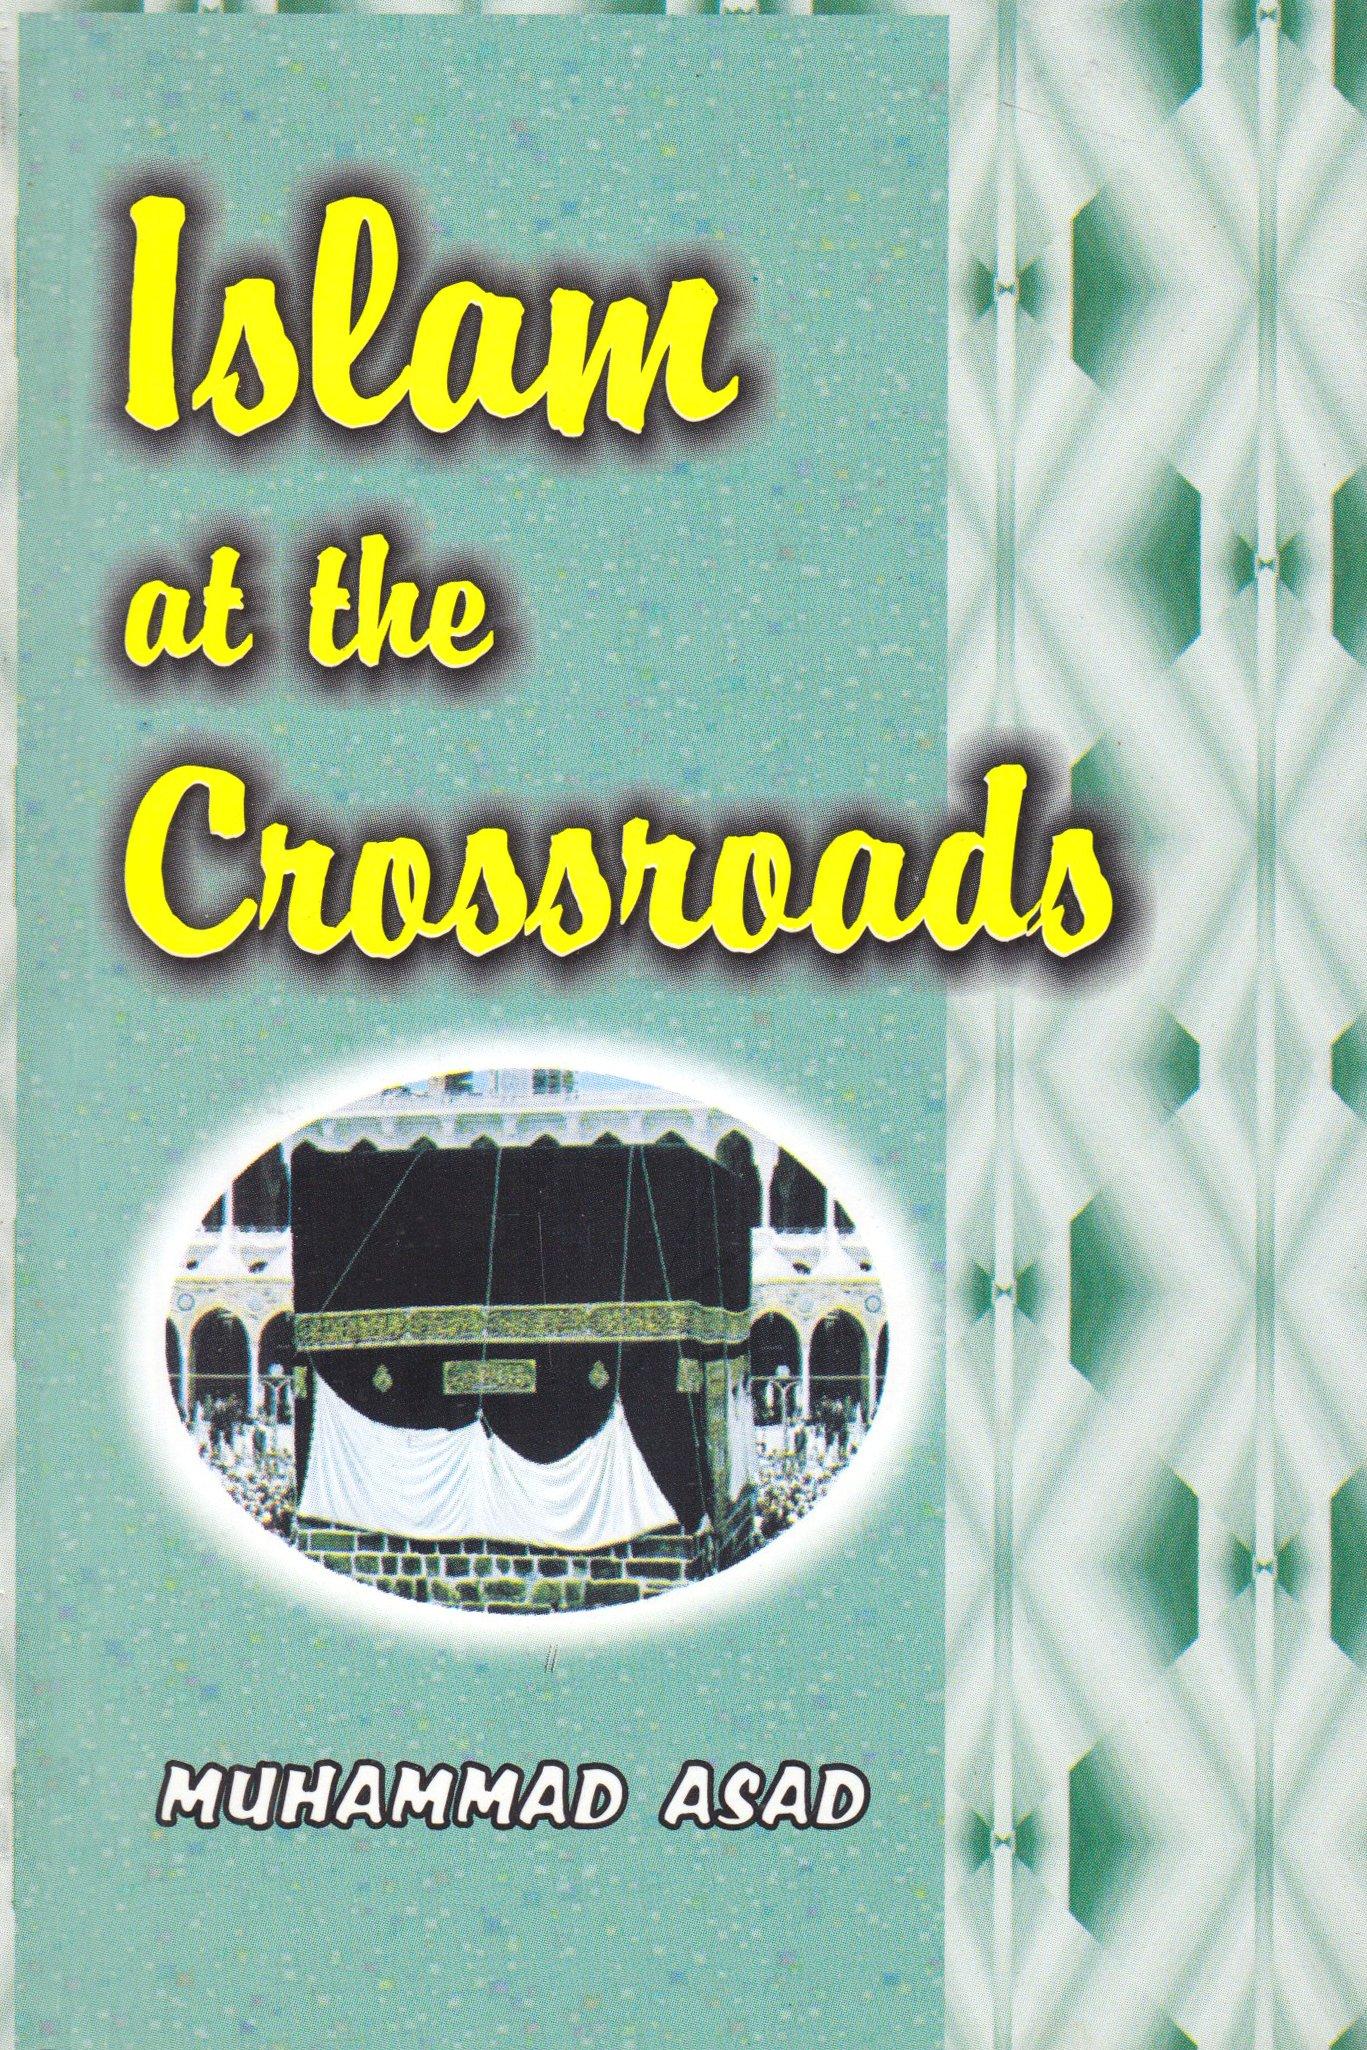 Amazon.com: Muhammad Asad: Books, Biography, Blog, Audiobooks, Kindle